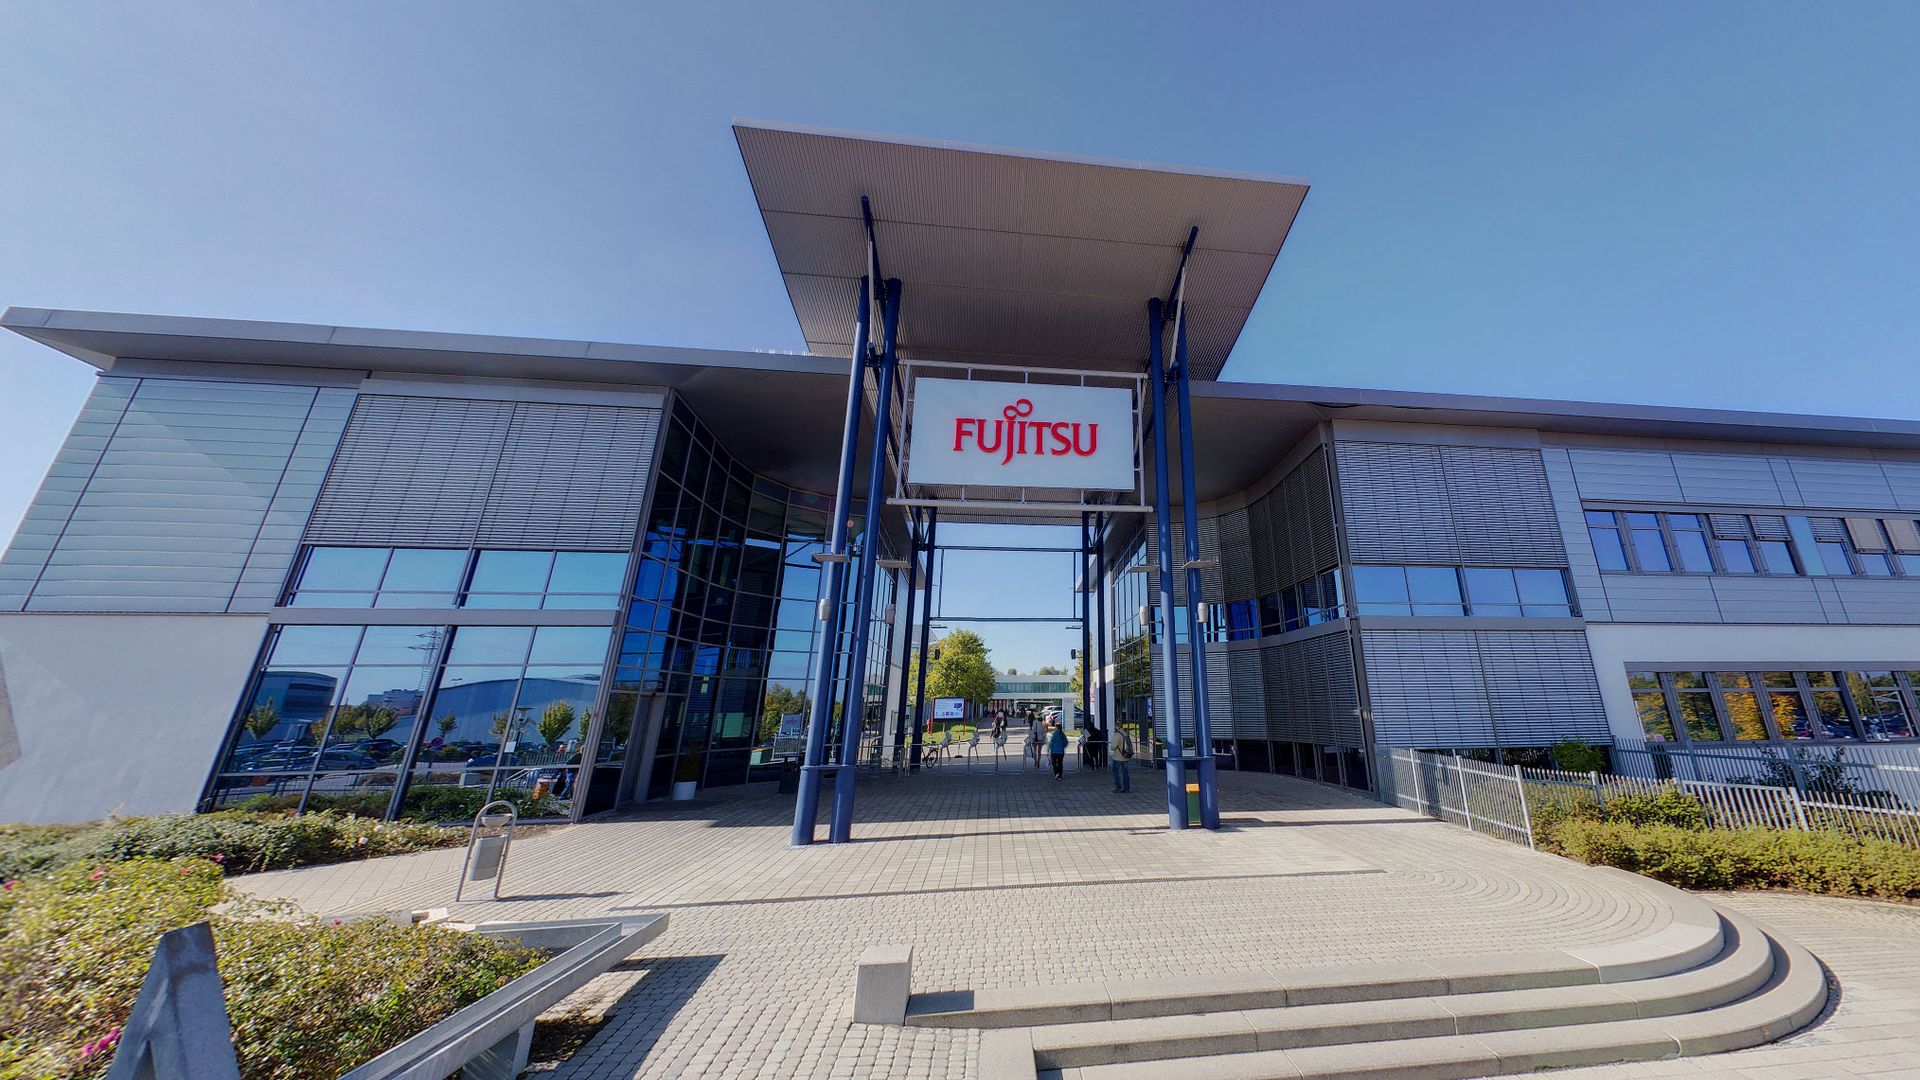 Fujitsu Augsburg